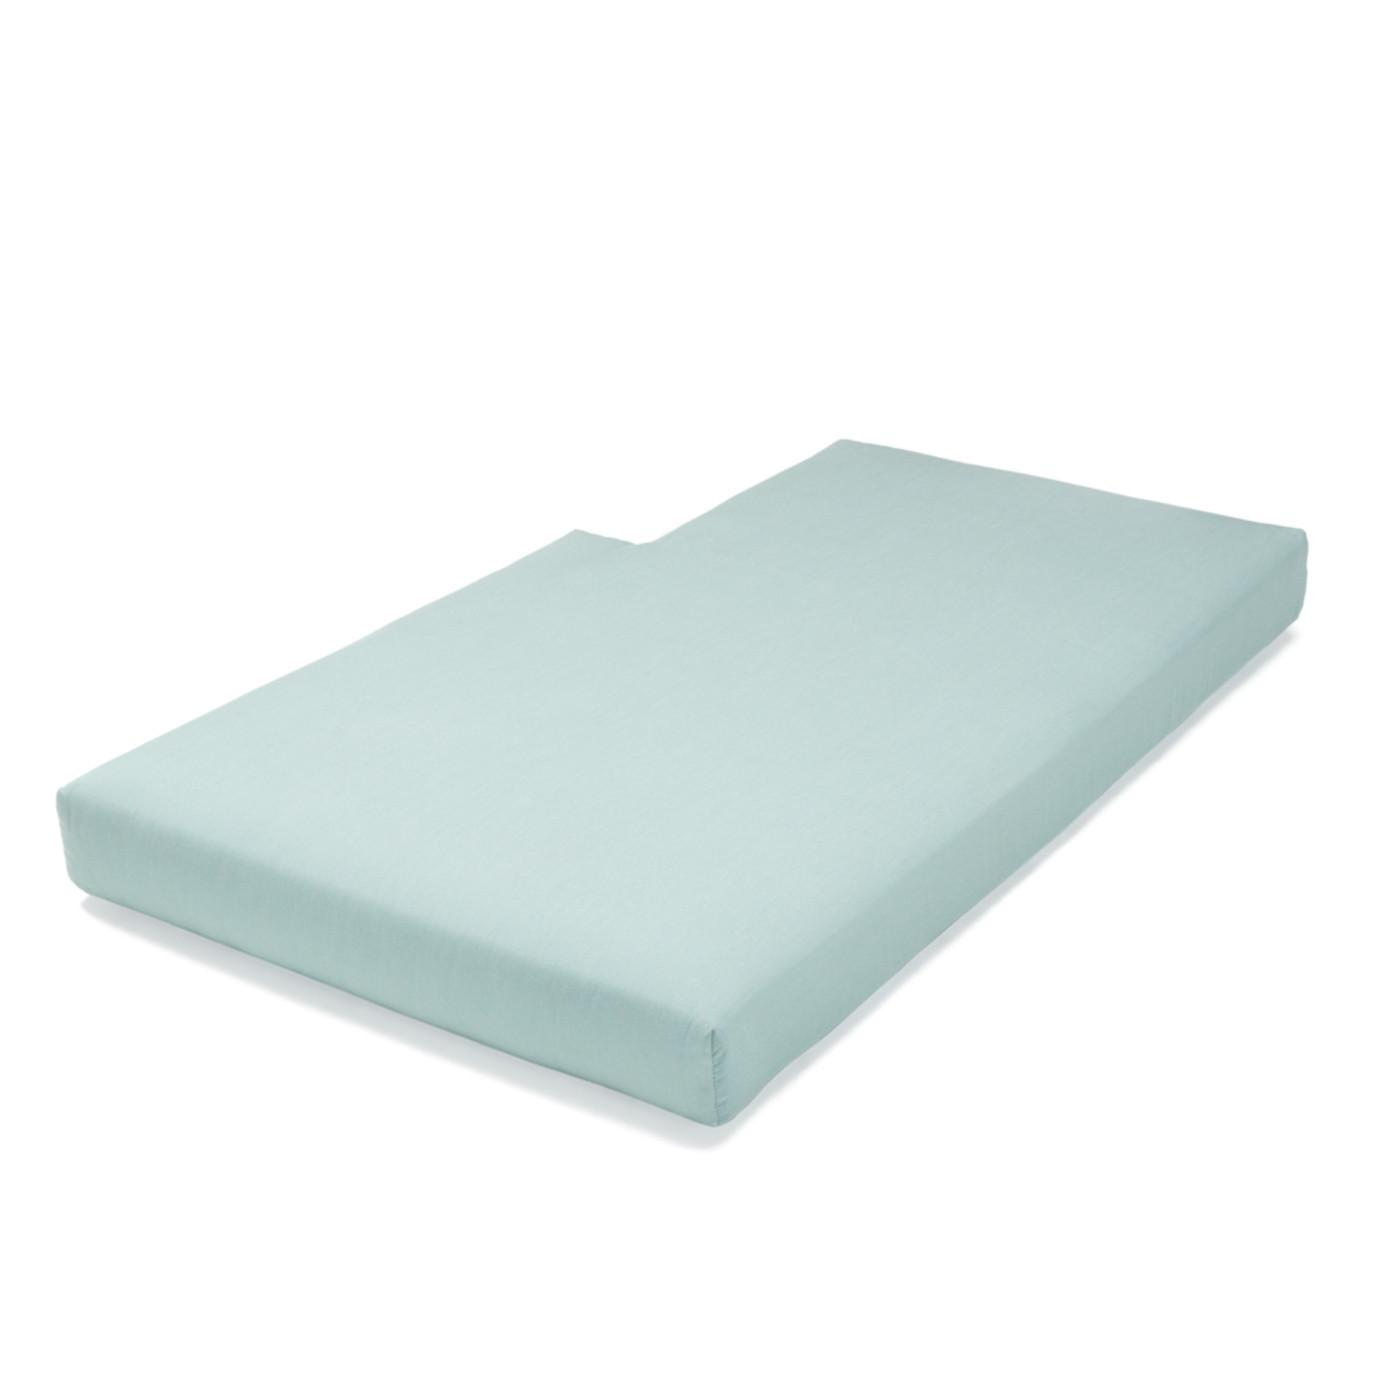 Portofino Casual 3pc Chaise Right Base Cushion - Spa Blue